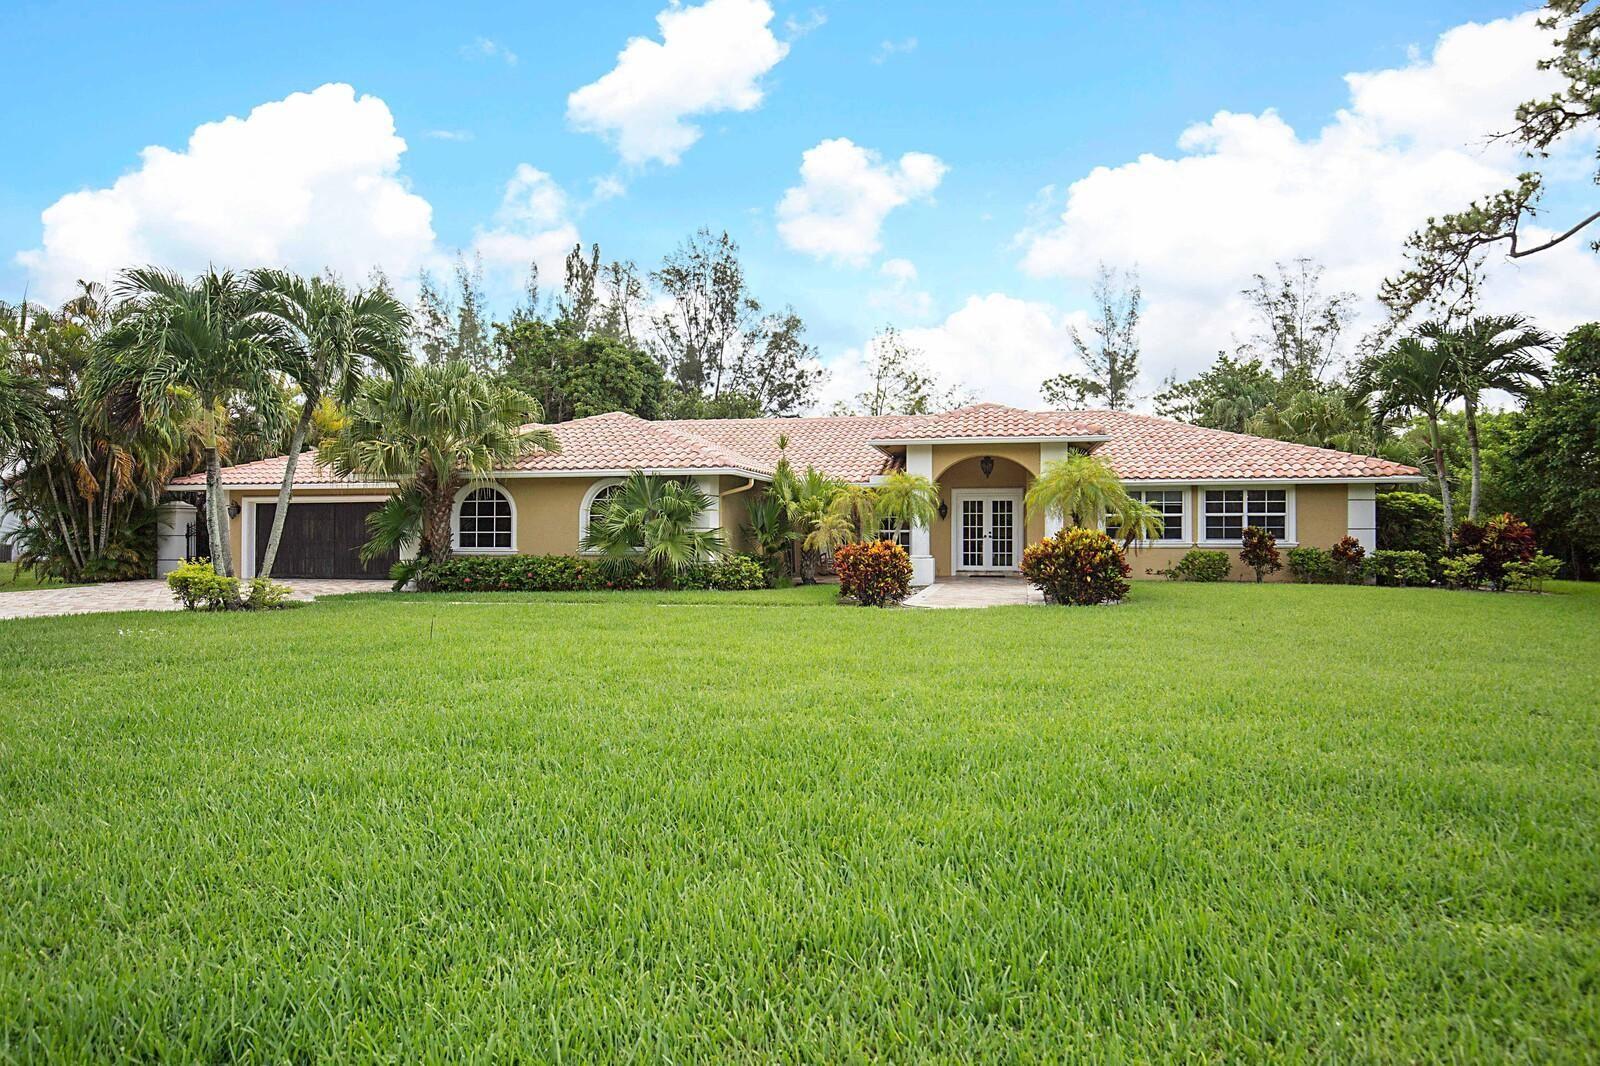 22180 Woodset Lane, Boca Raton, FL 33428 - #: RX-10646772